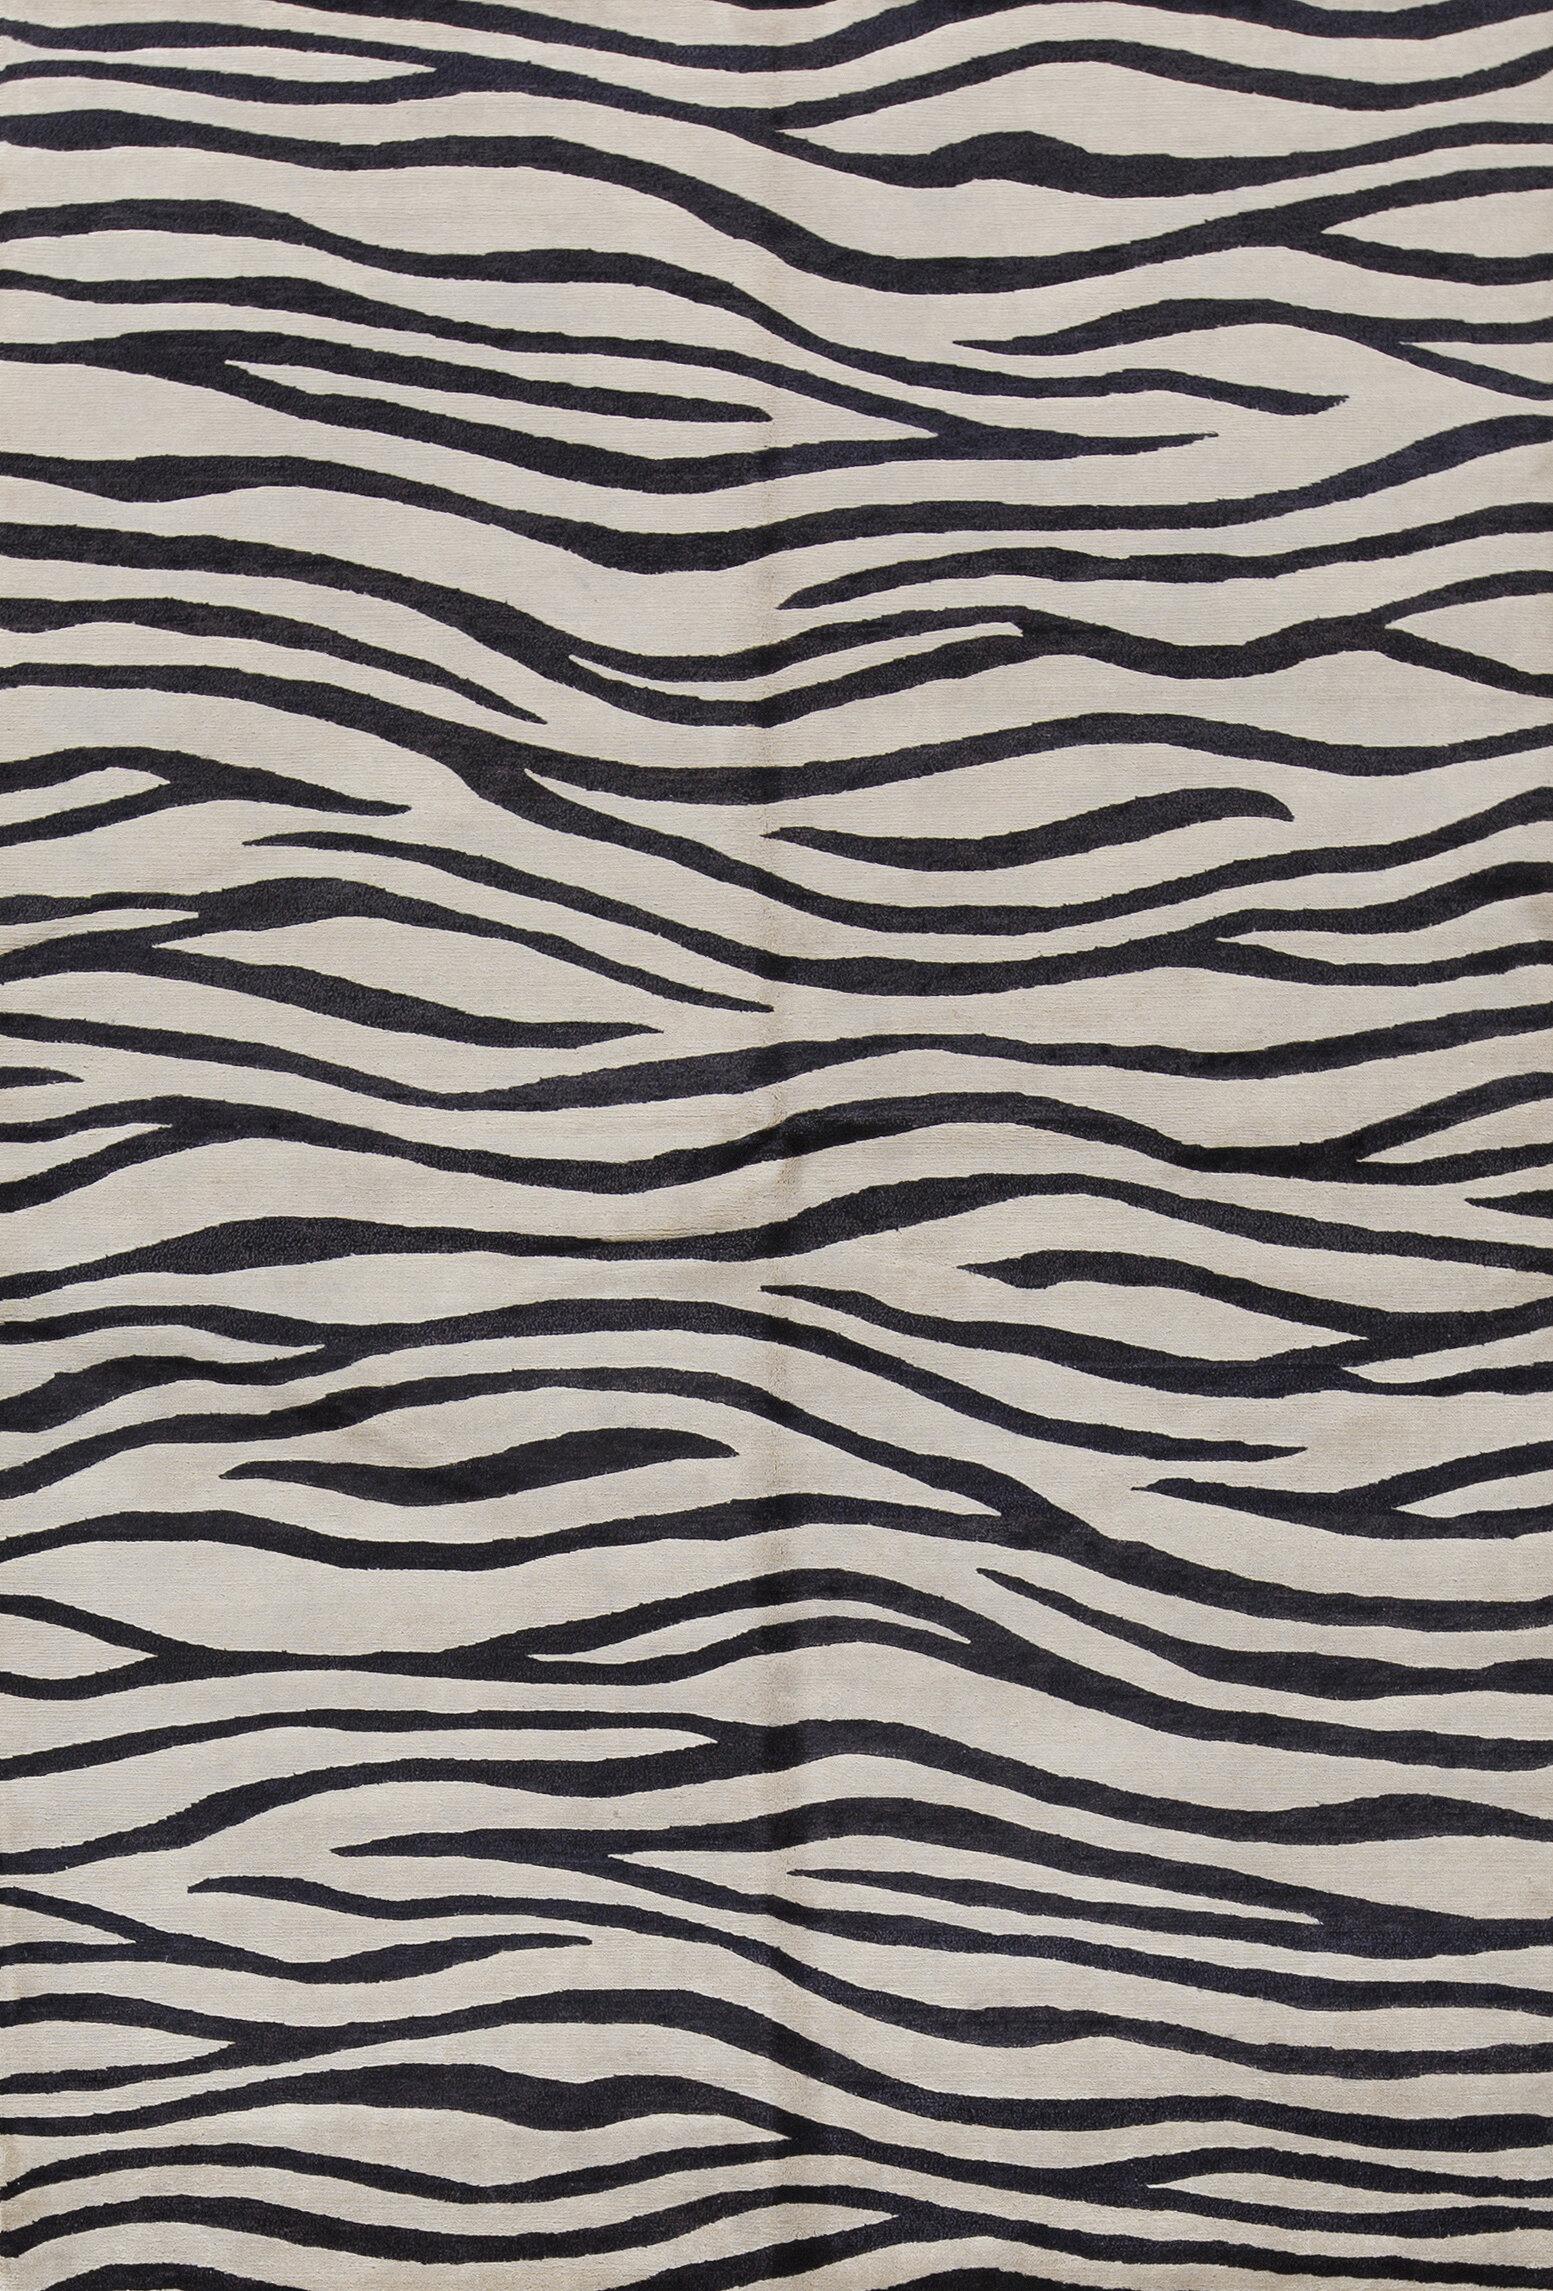 Animal Print Bokara Rug Co Inc Area Rugs You Ll Love In 2021 Wayfair